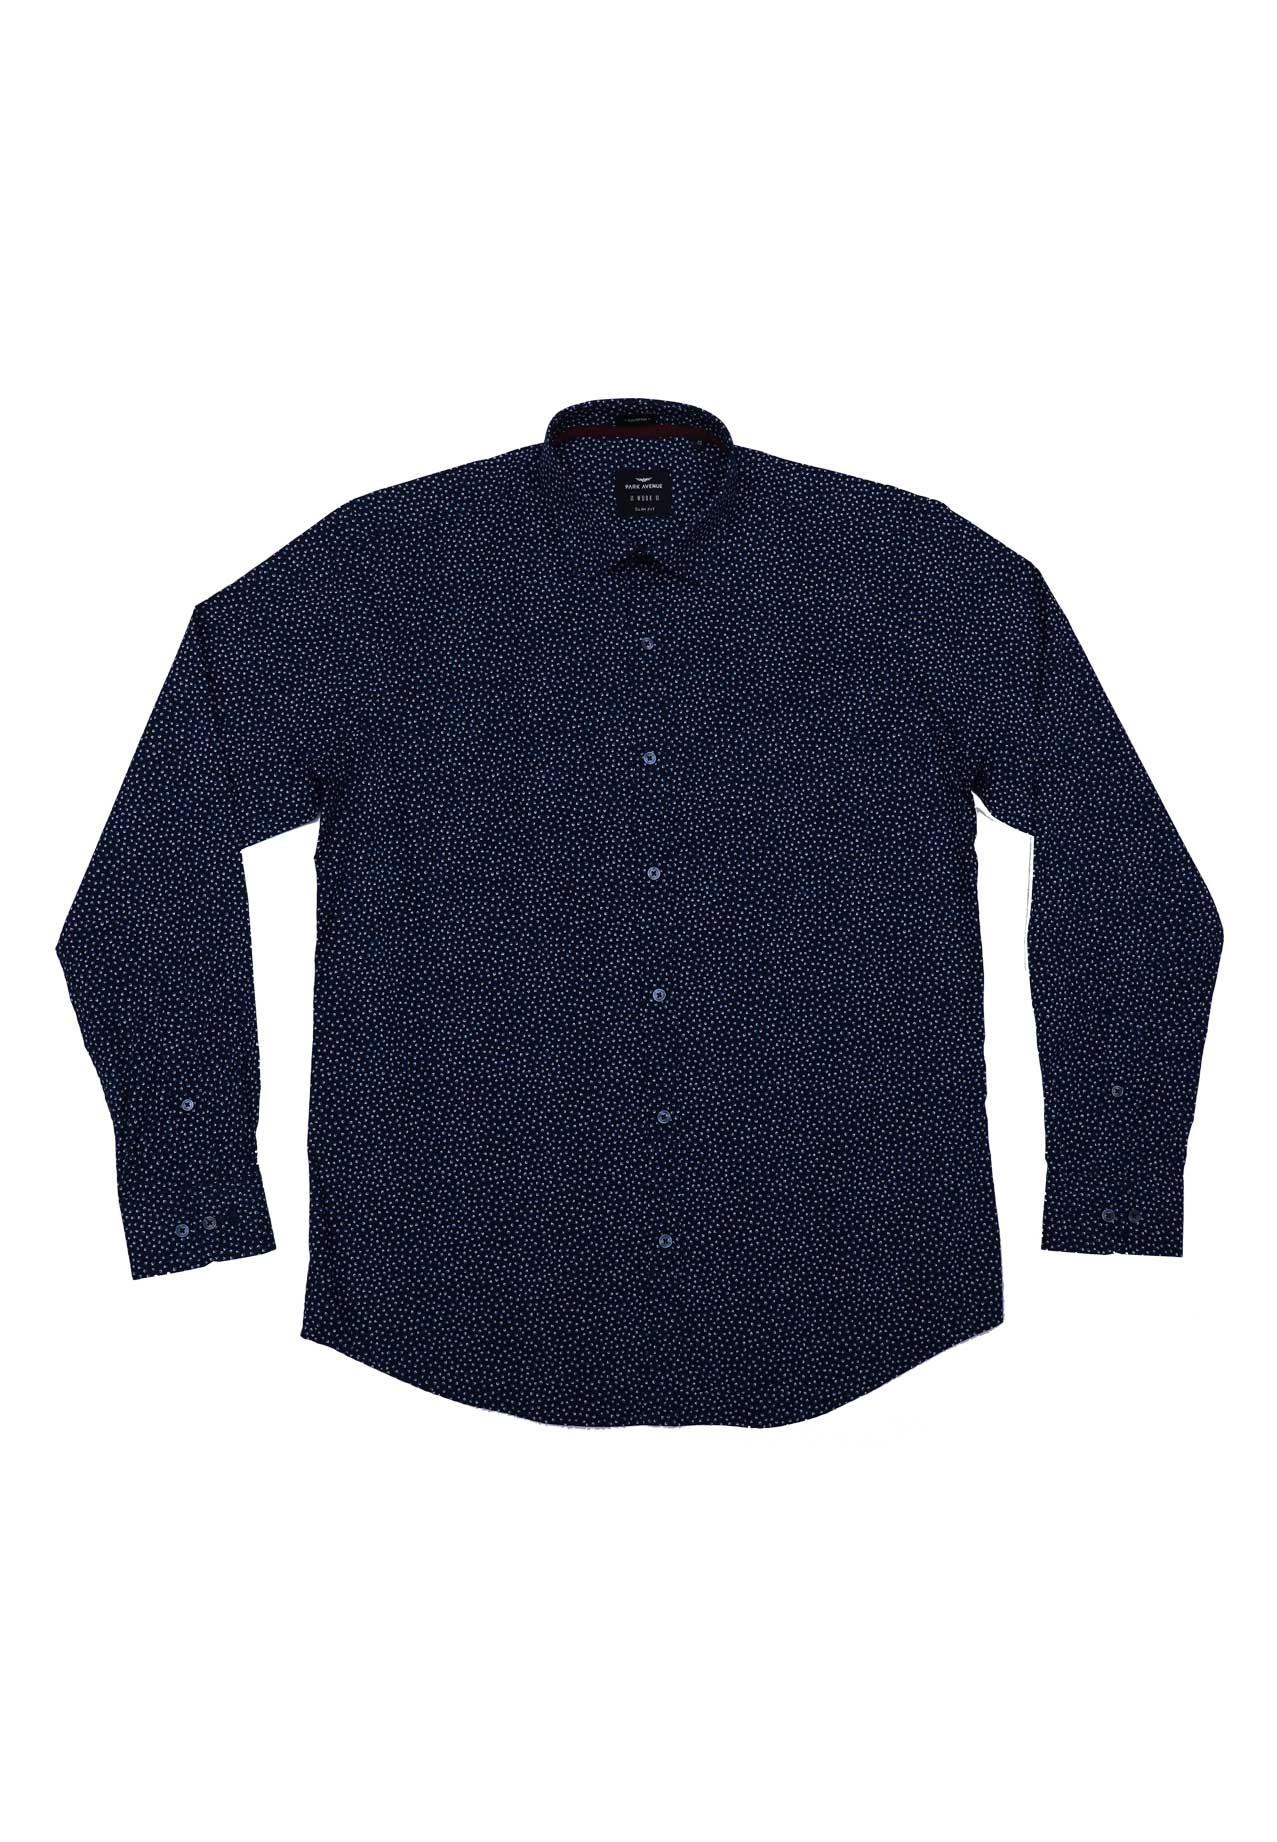 Park Avenue PMSY12376-B8 Mens Shirt, Size 42